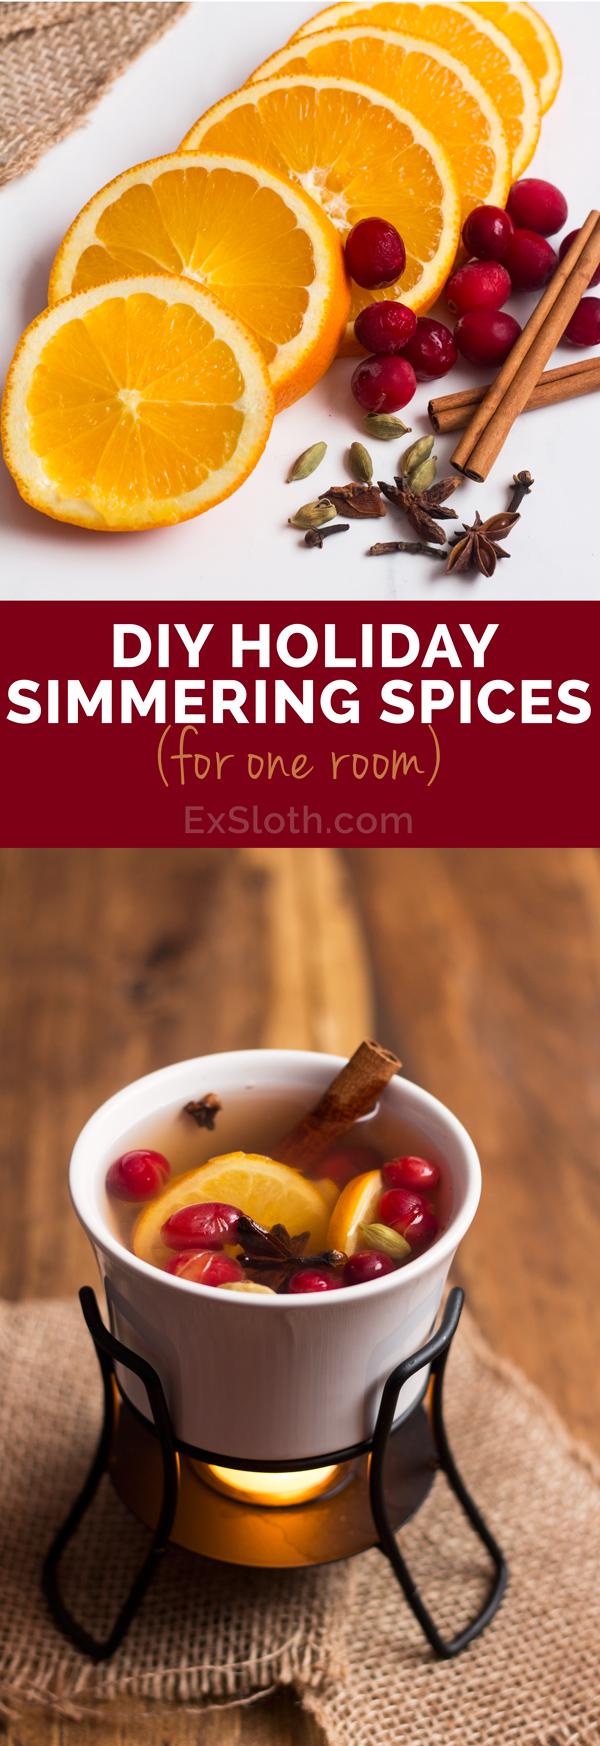 Holiday Simmering Spices for one room (Orange & Cranberry) via @ExSloth | ExSloth.com